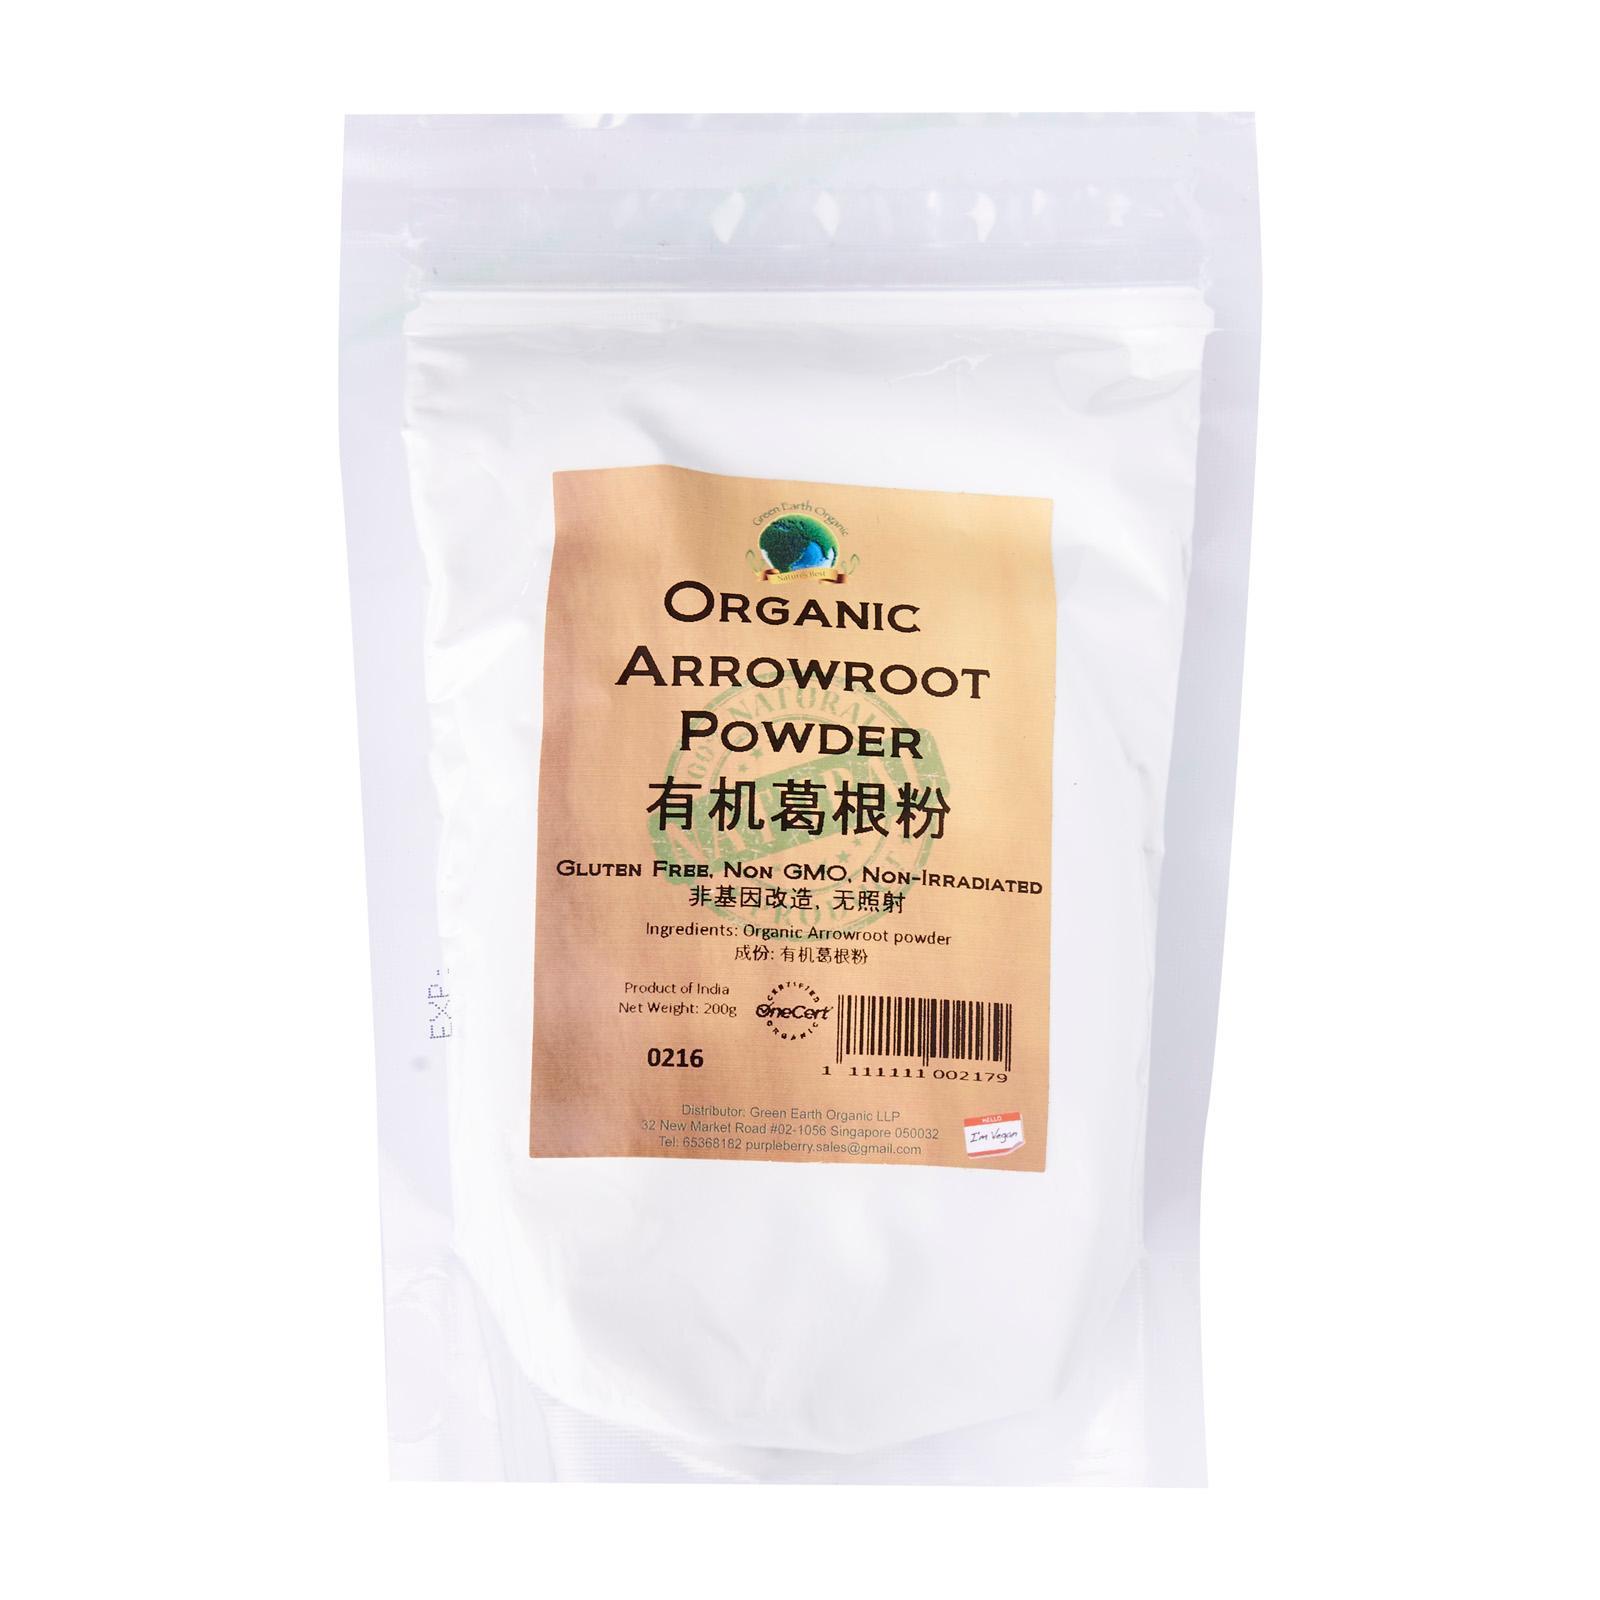 Organic Arrowroot Powder.